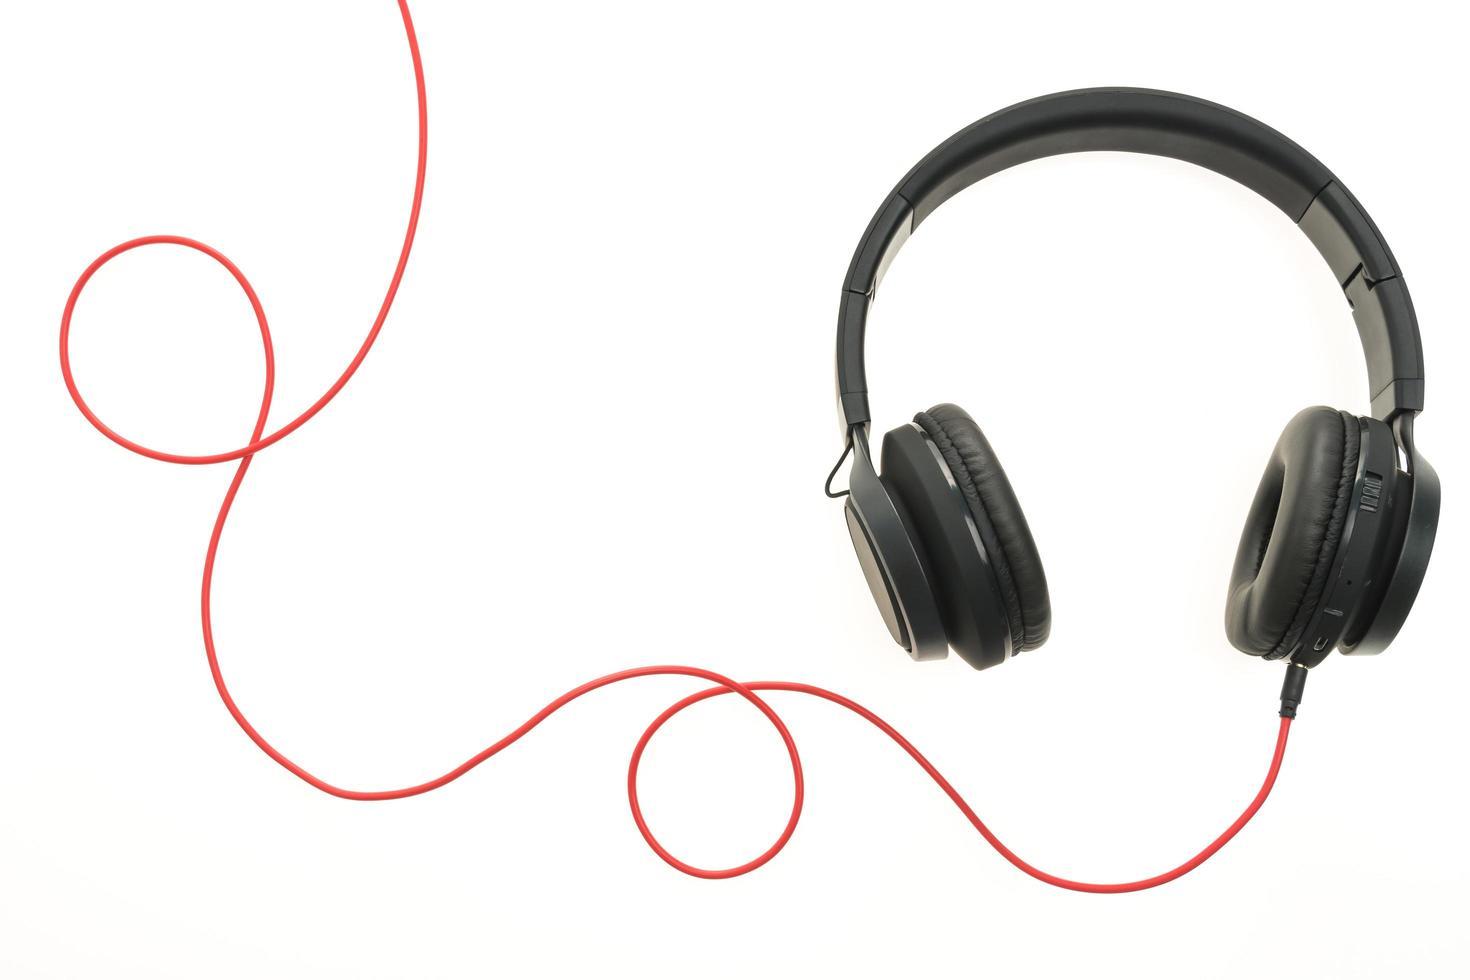 koptelefoon op witte achtergrond foto